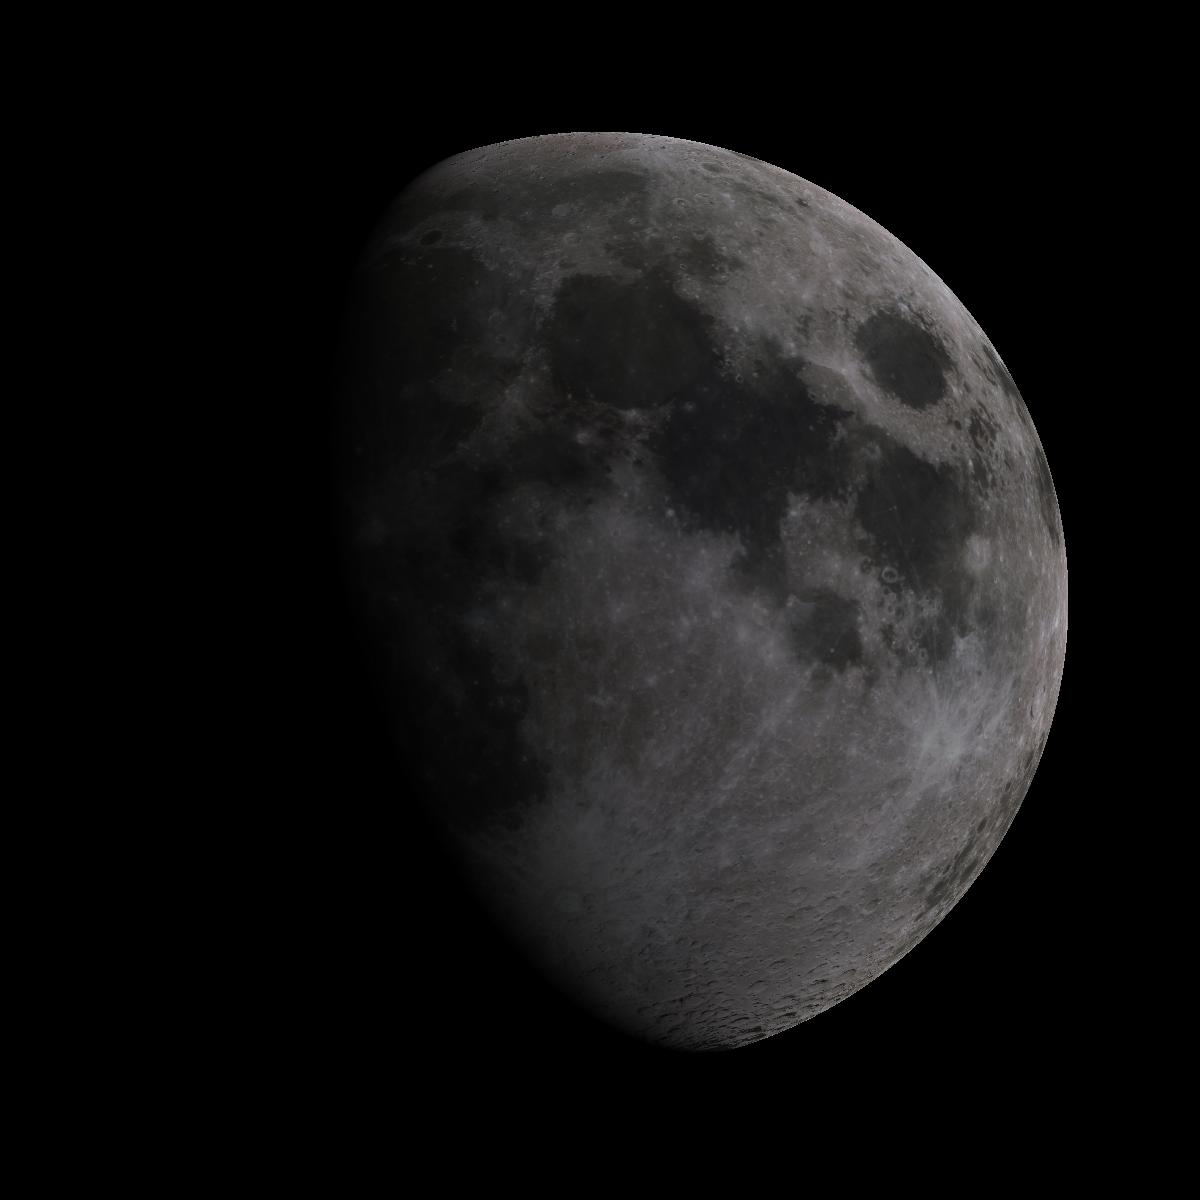 Lune du 12 juillet 2019